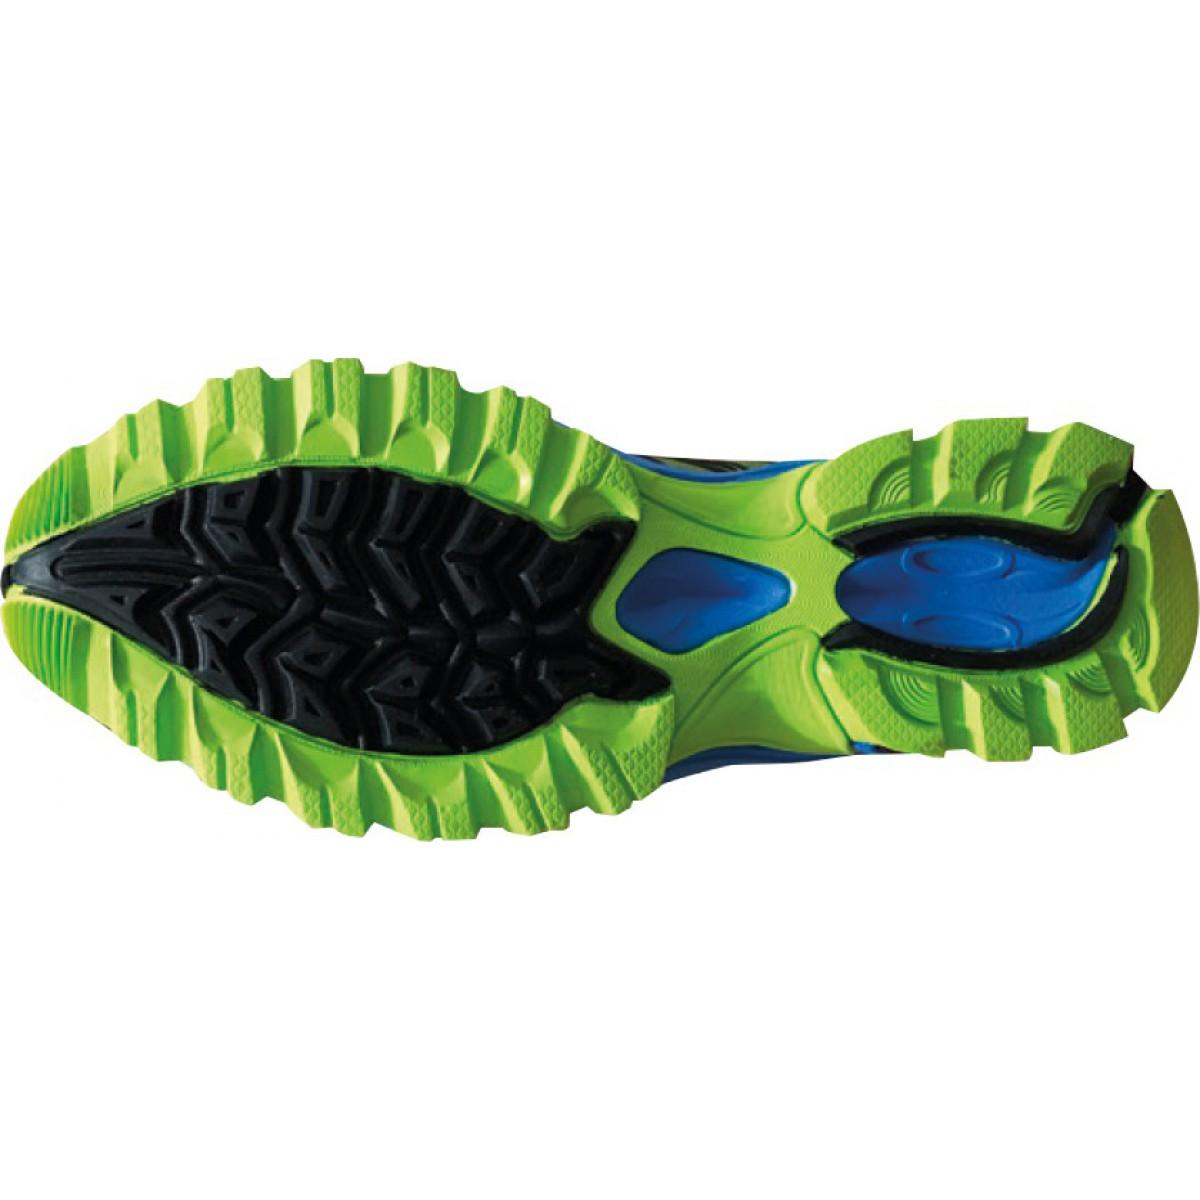 Chaussures basses de sécurité type Running SILVERSTONE T46